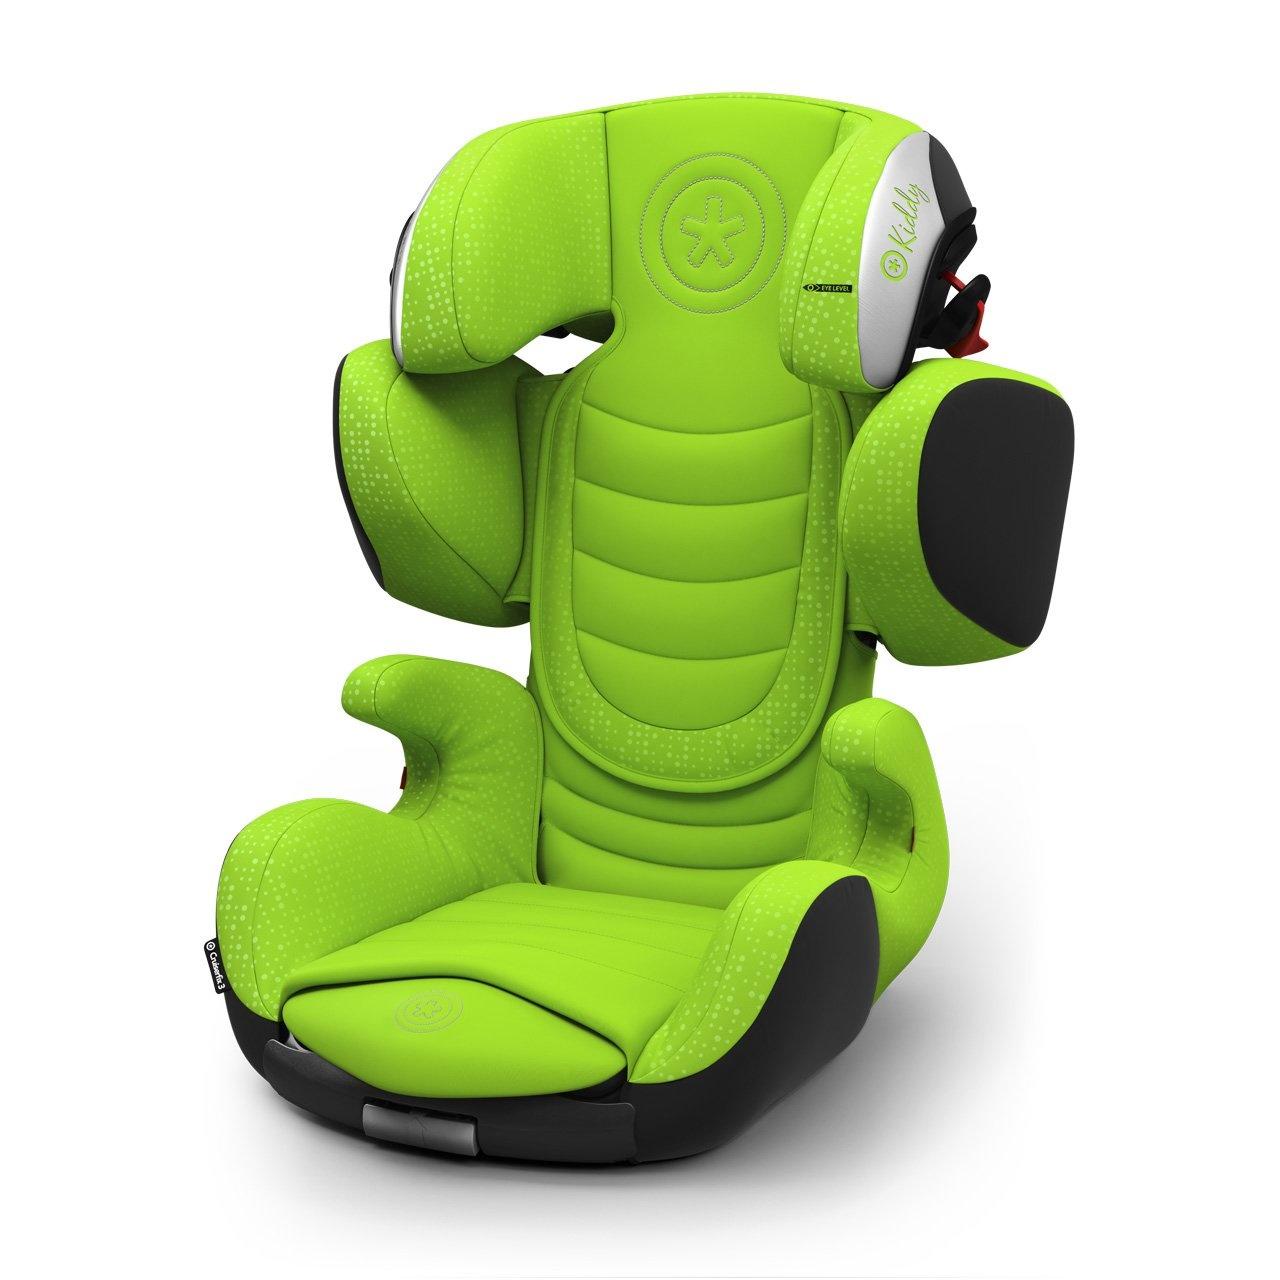 Kiddy Kiddy Cruiserfix 3 Lizard Green 2019